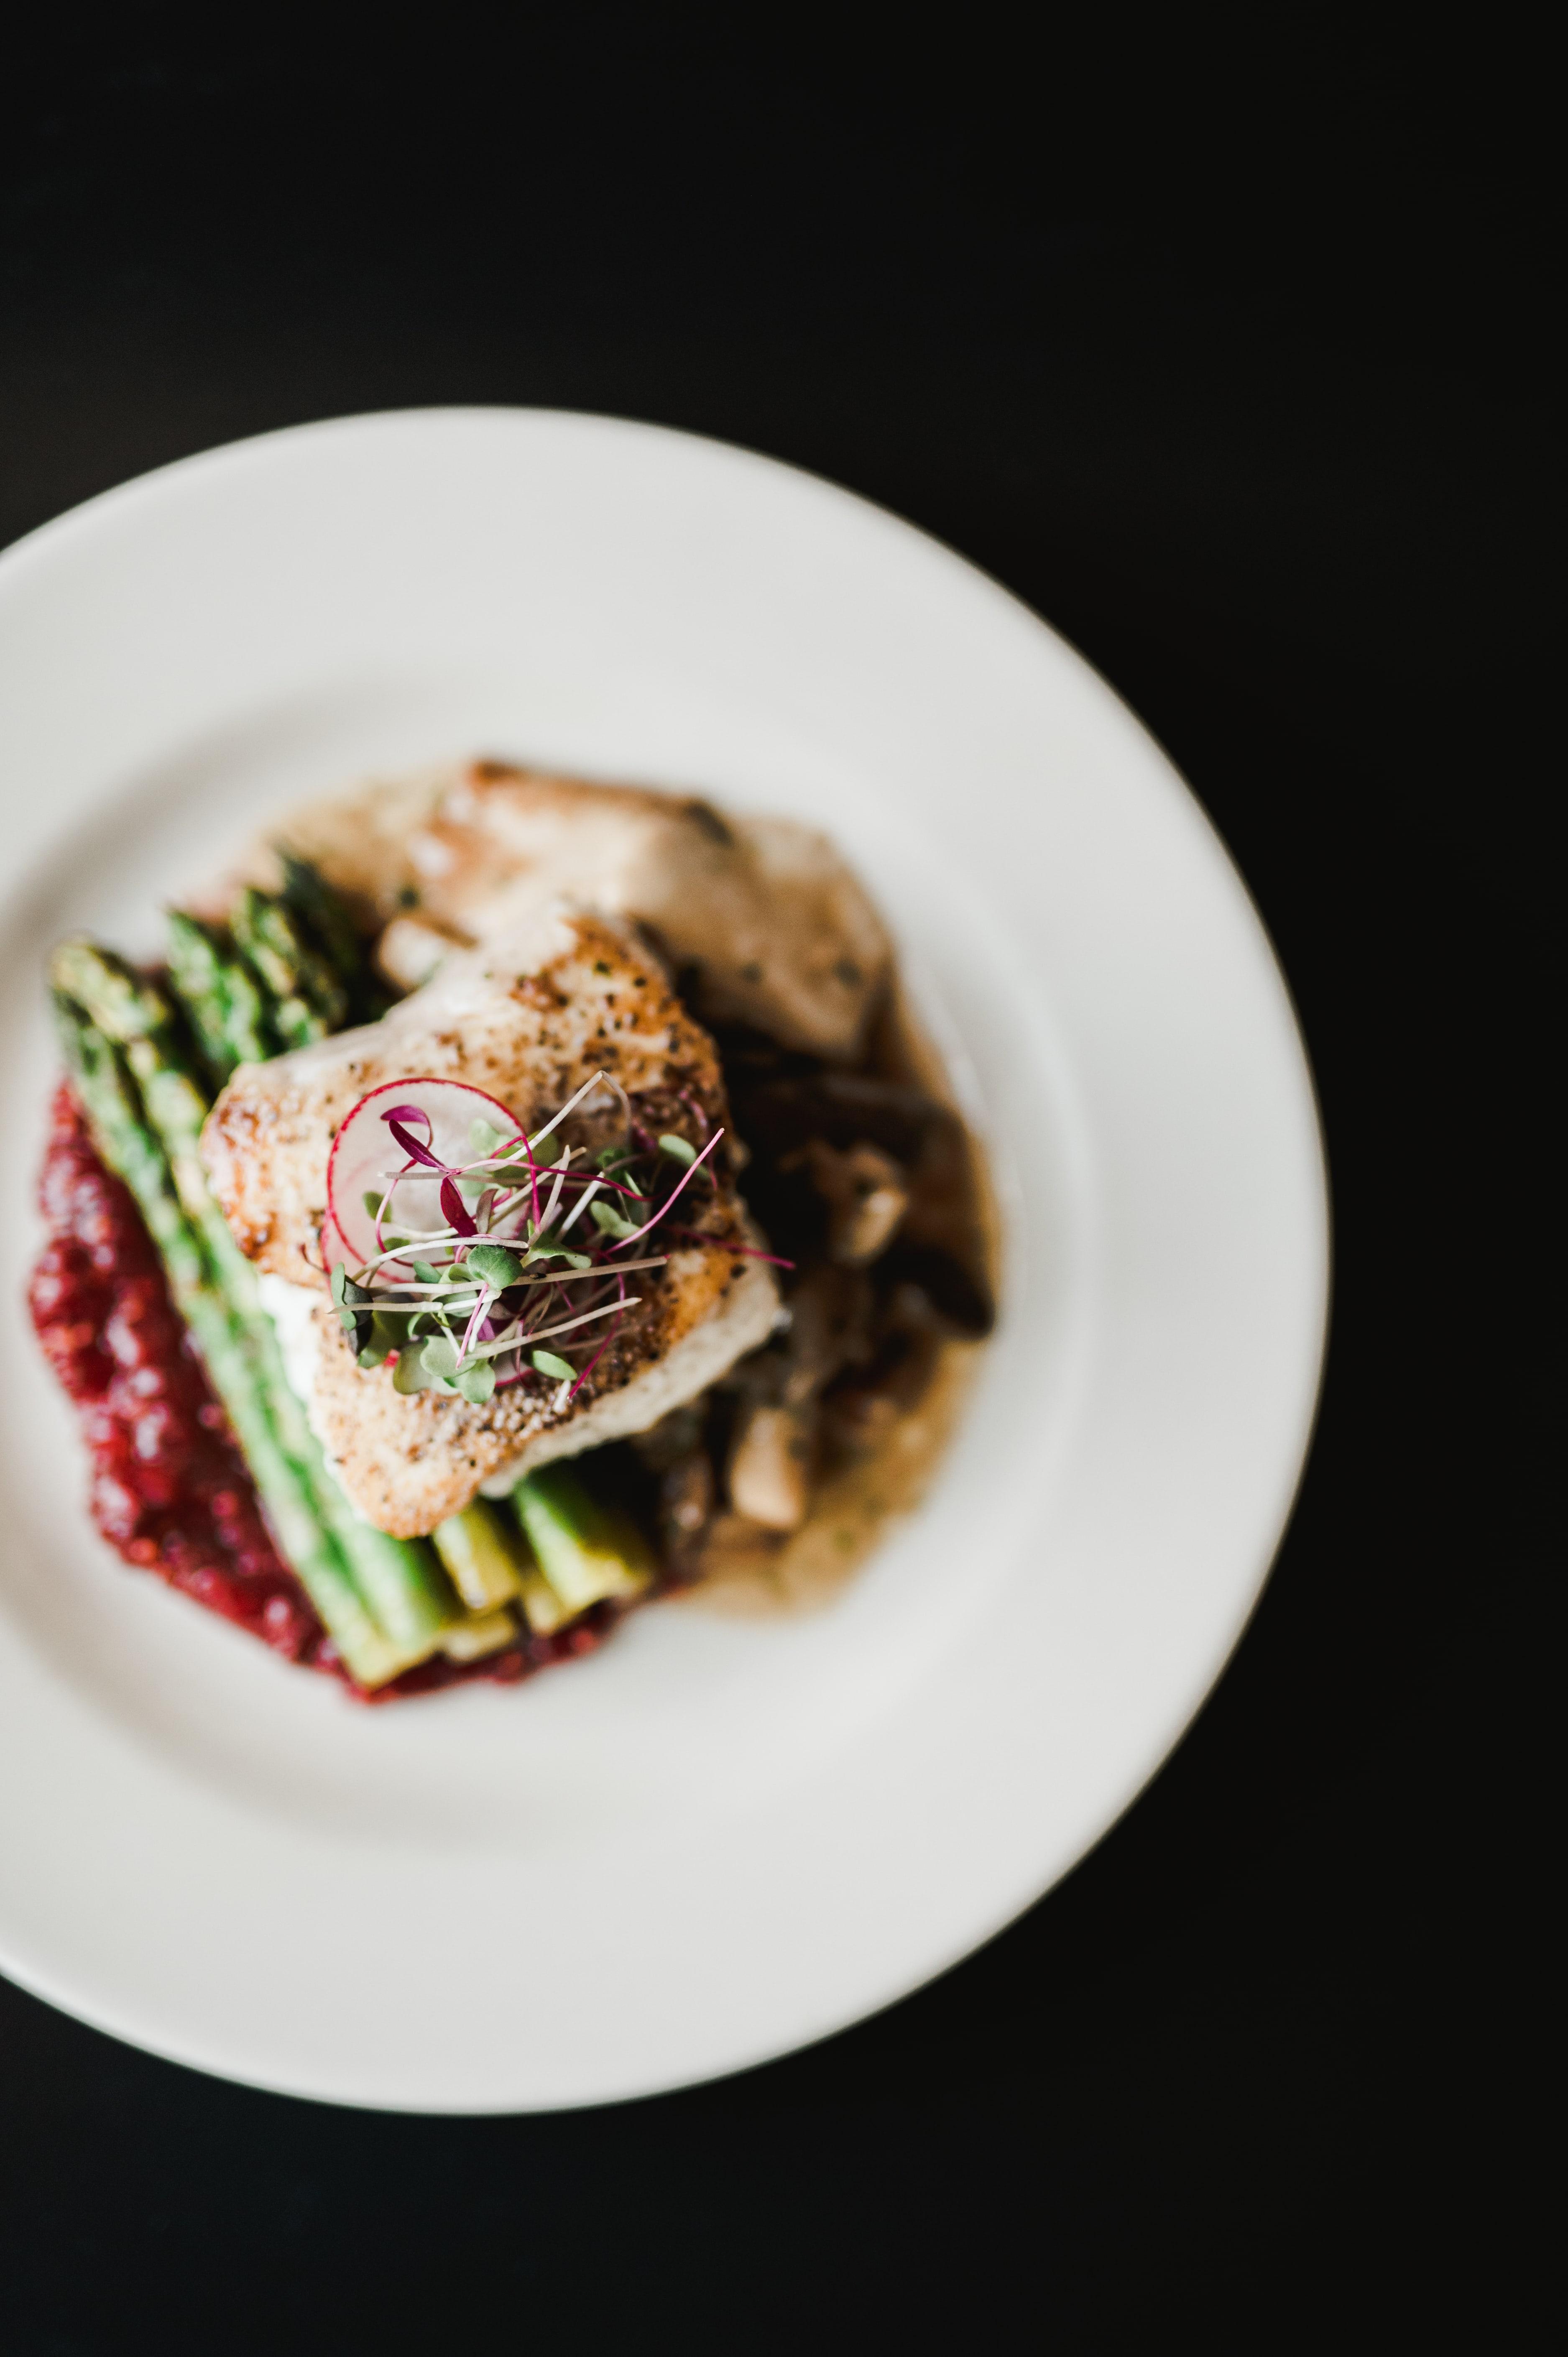 Salmon entree dish